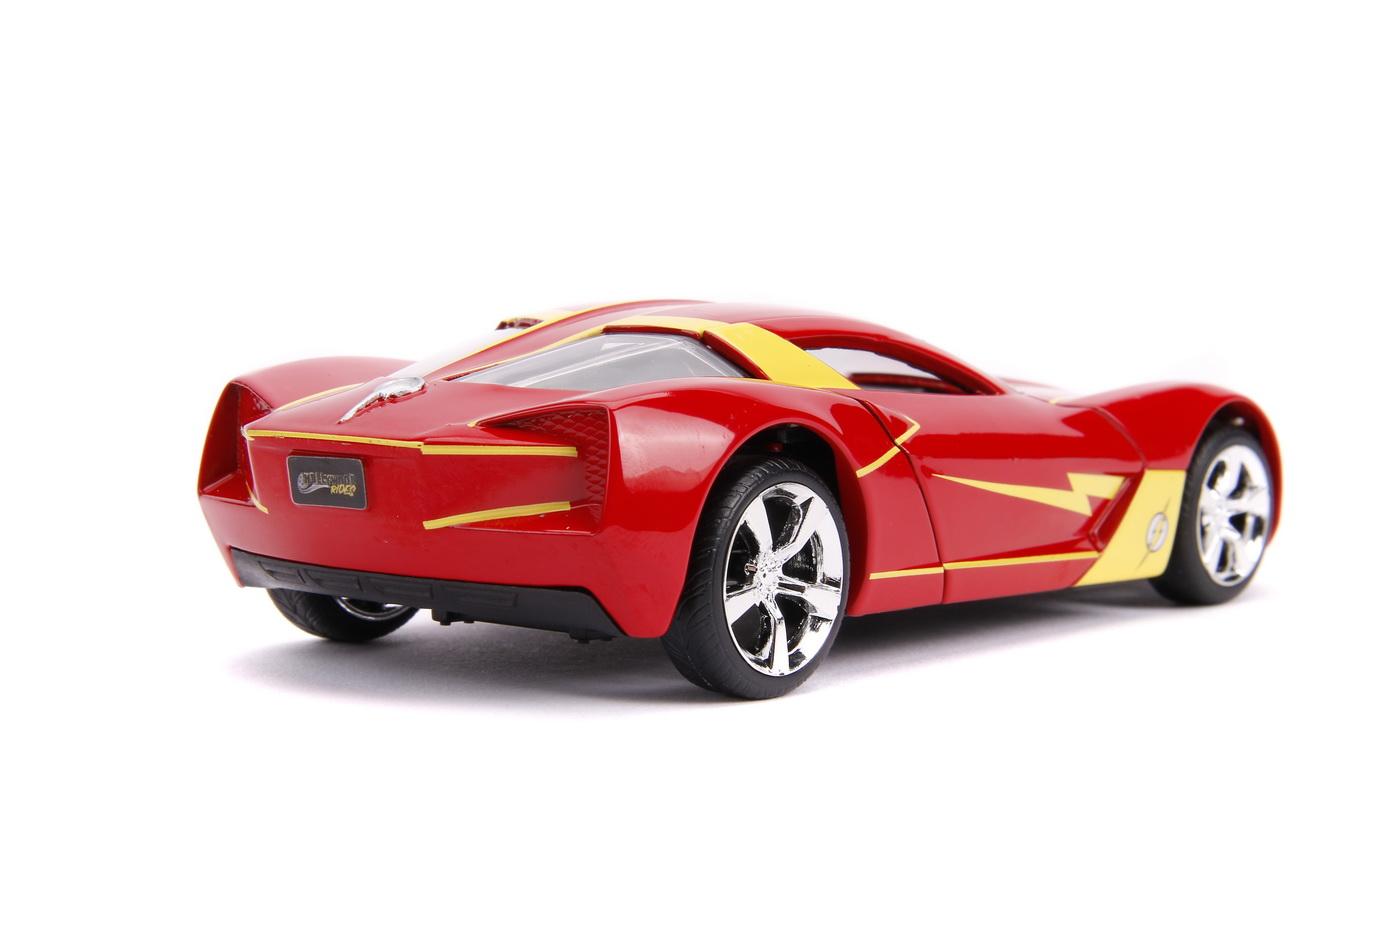 Masinuta Metalica Flash 2009 Chevy Corvette Scara 1 La 32 | JadaToys - 4